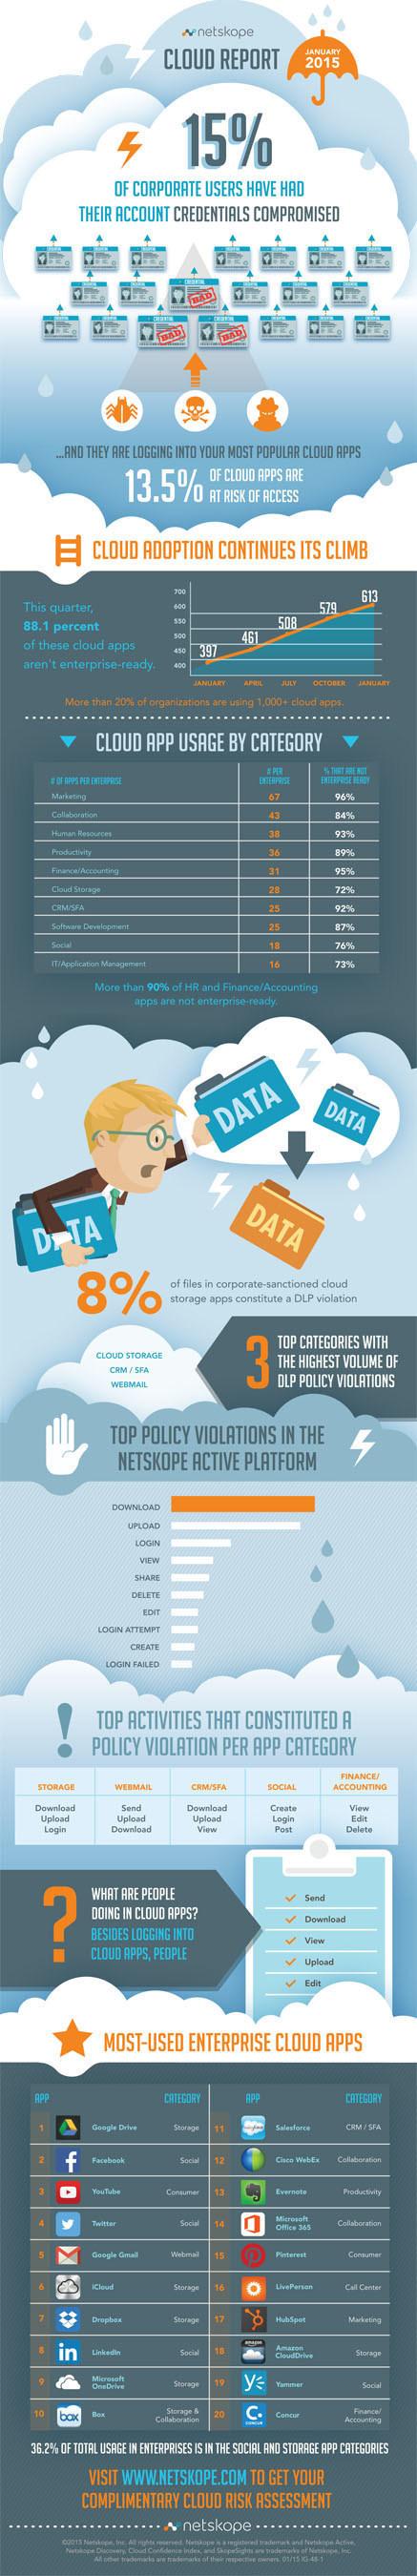 Netskope Cloud Report January 2015